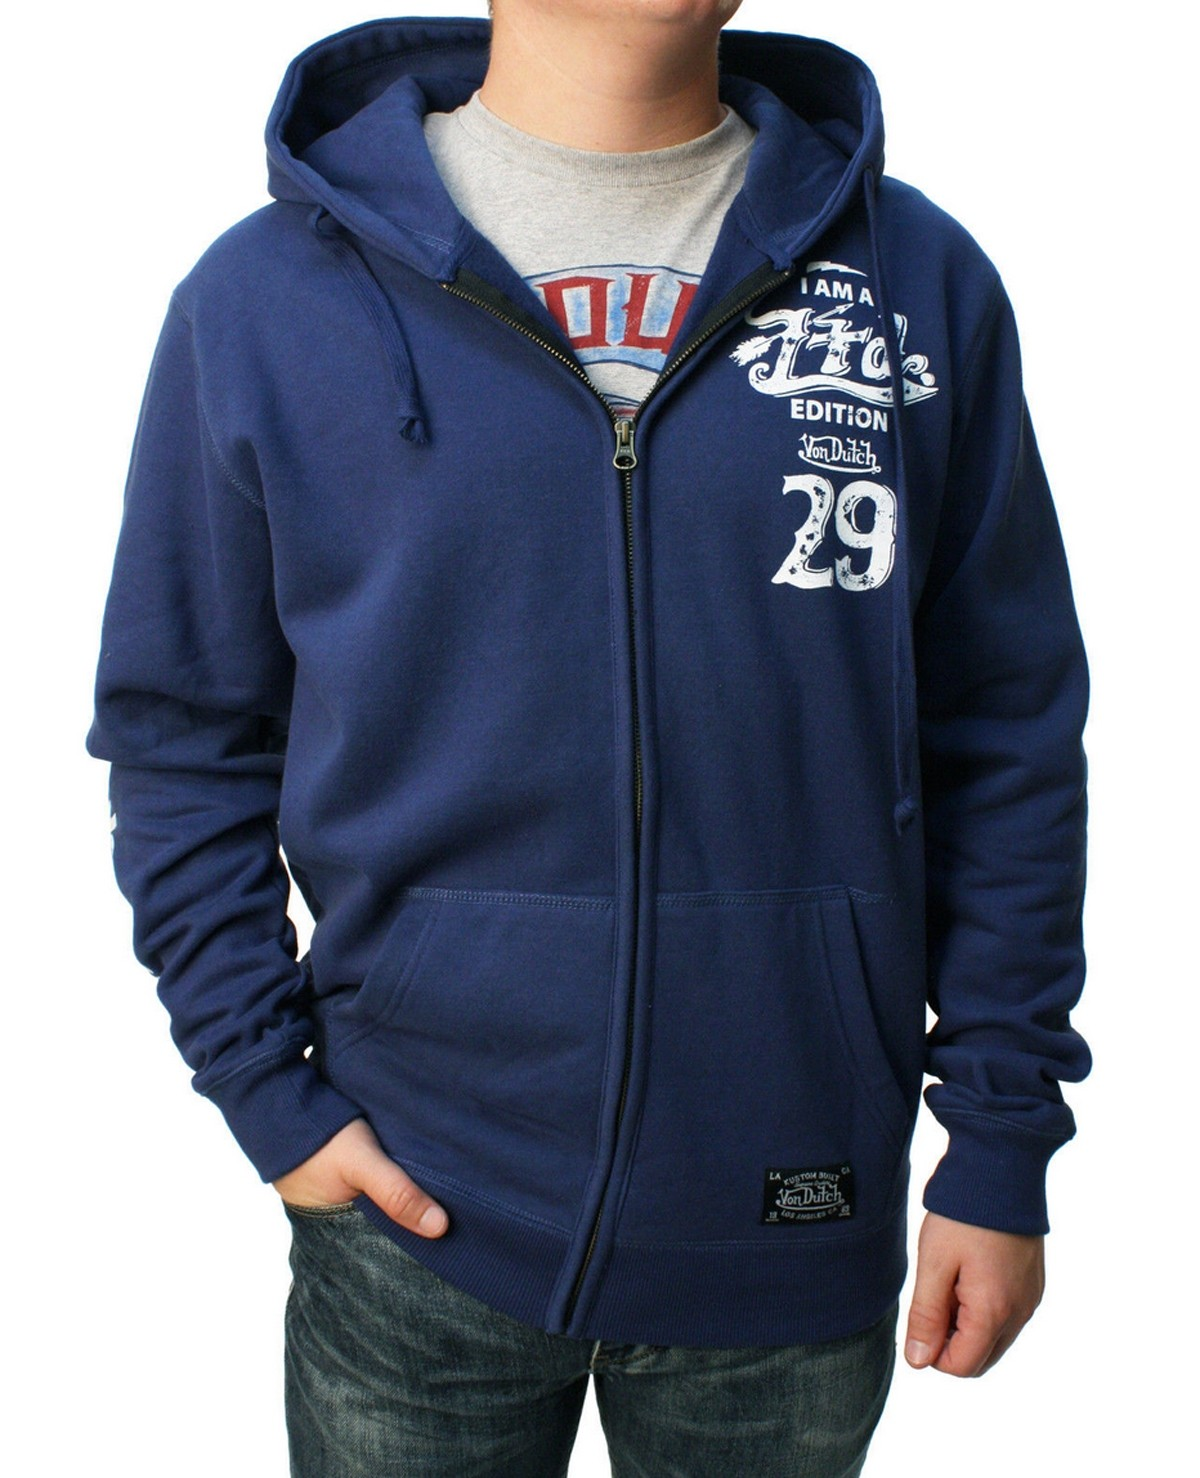 Von Dutch - I Am A Limited Edition Zipper Hoodie